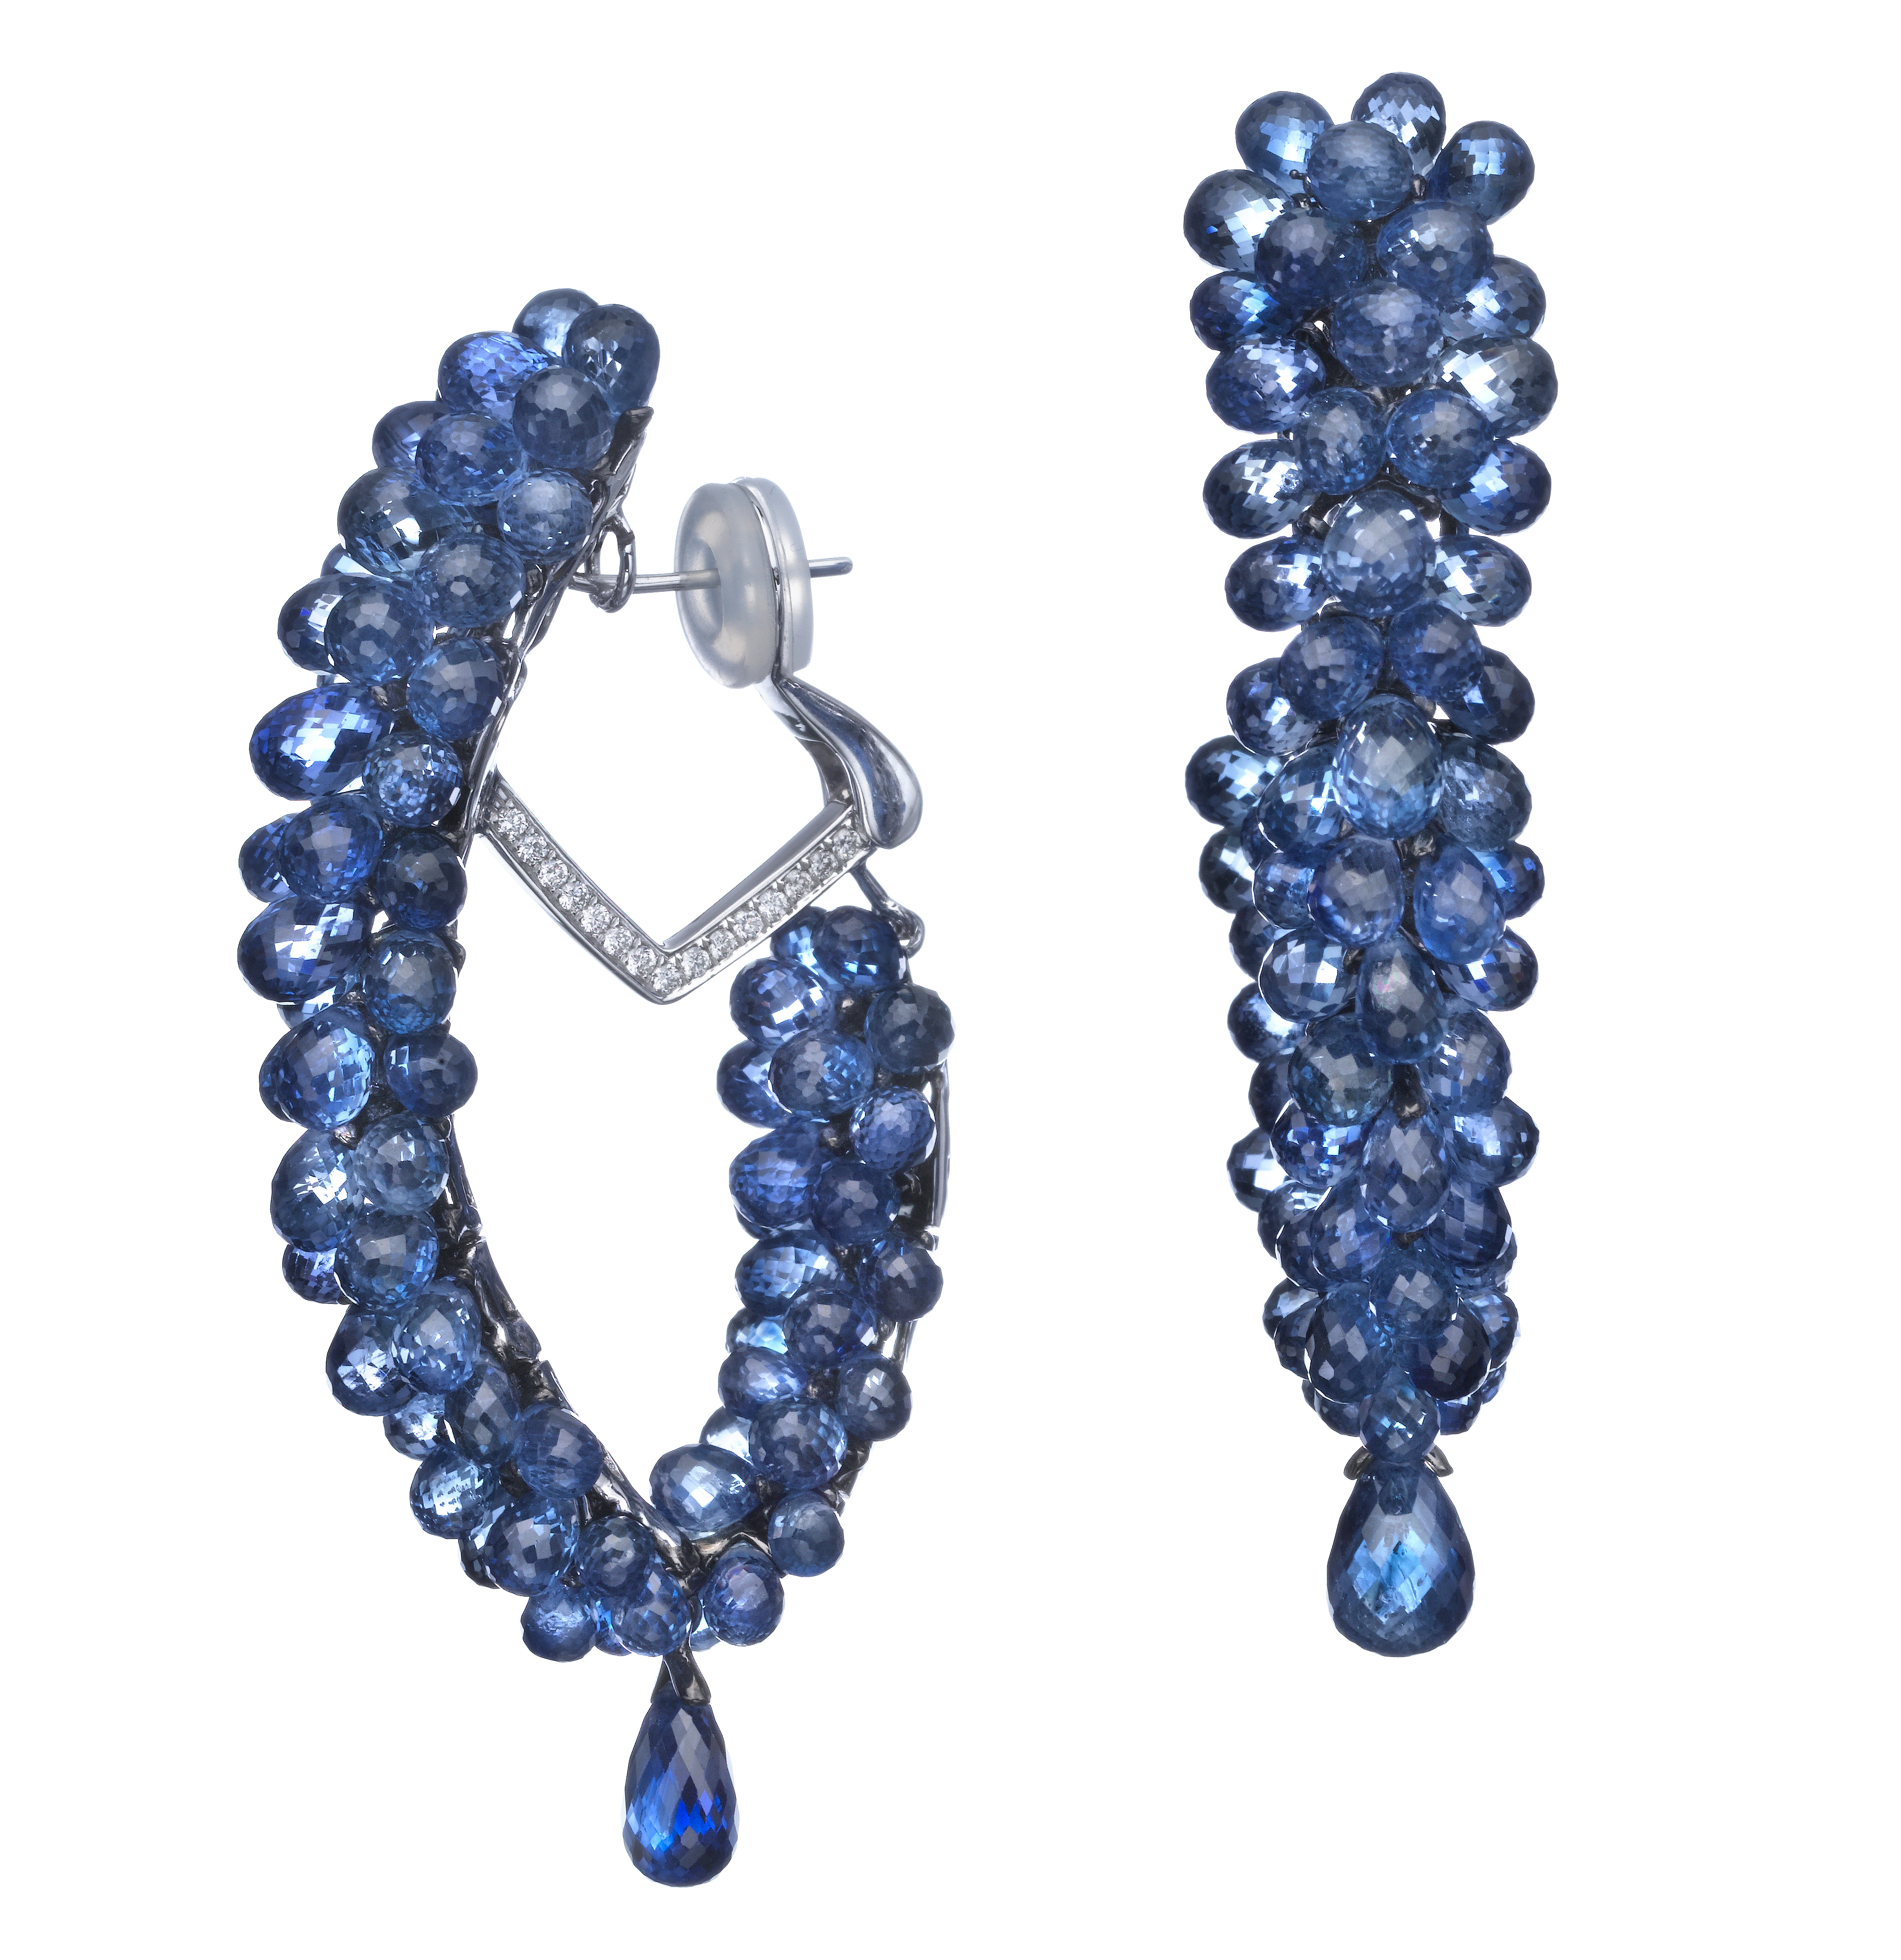 Butani sapphire earrings